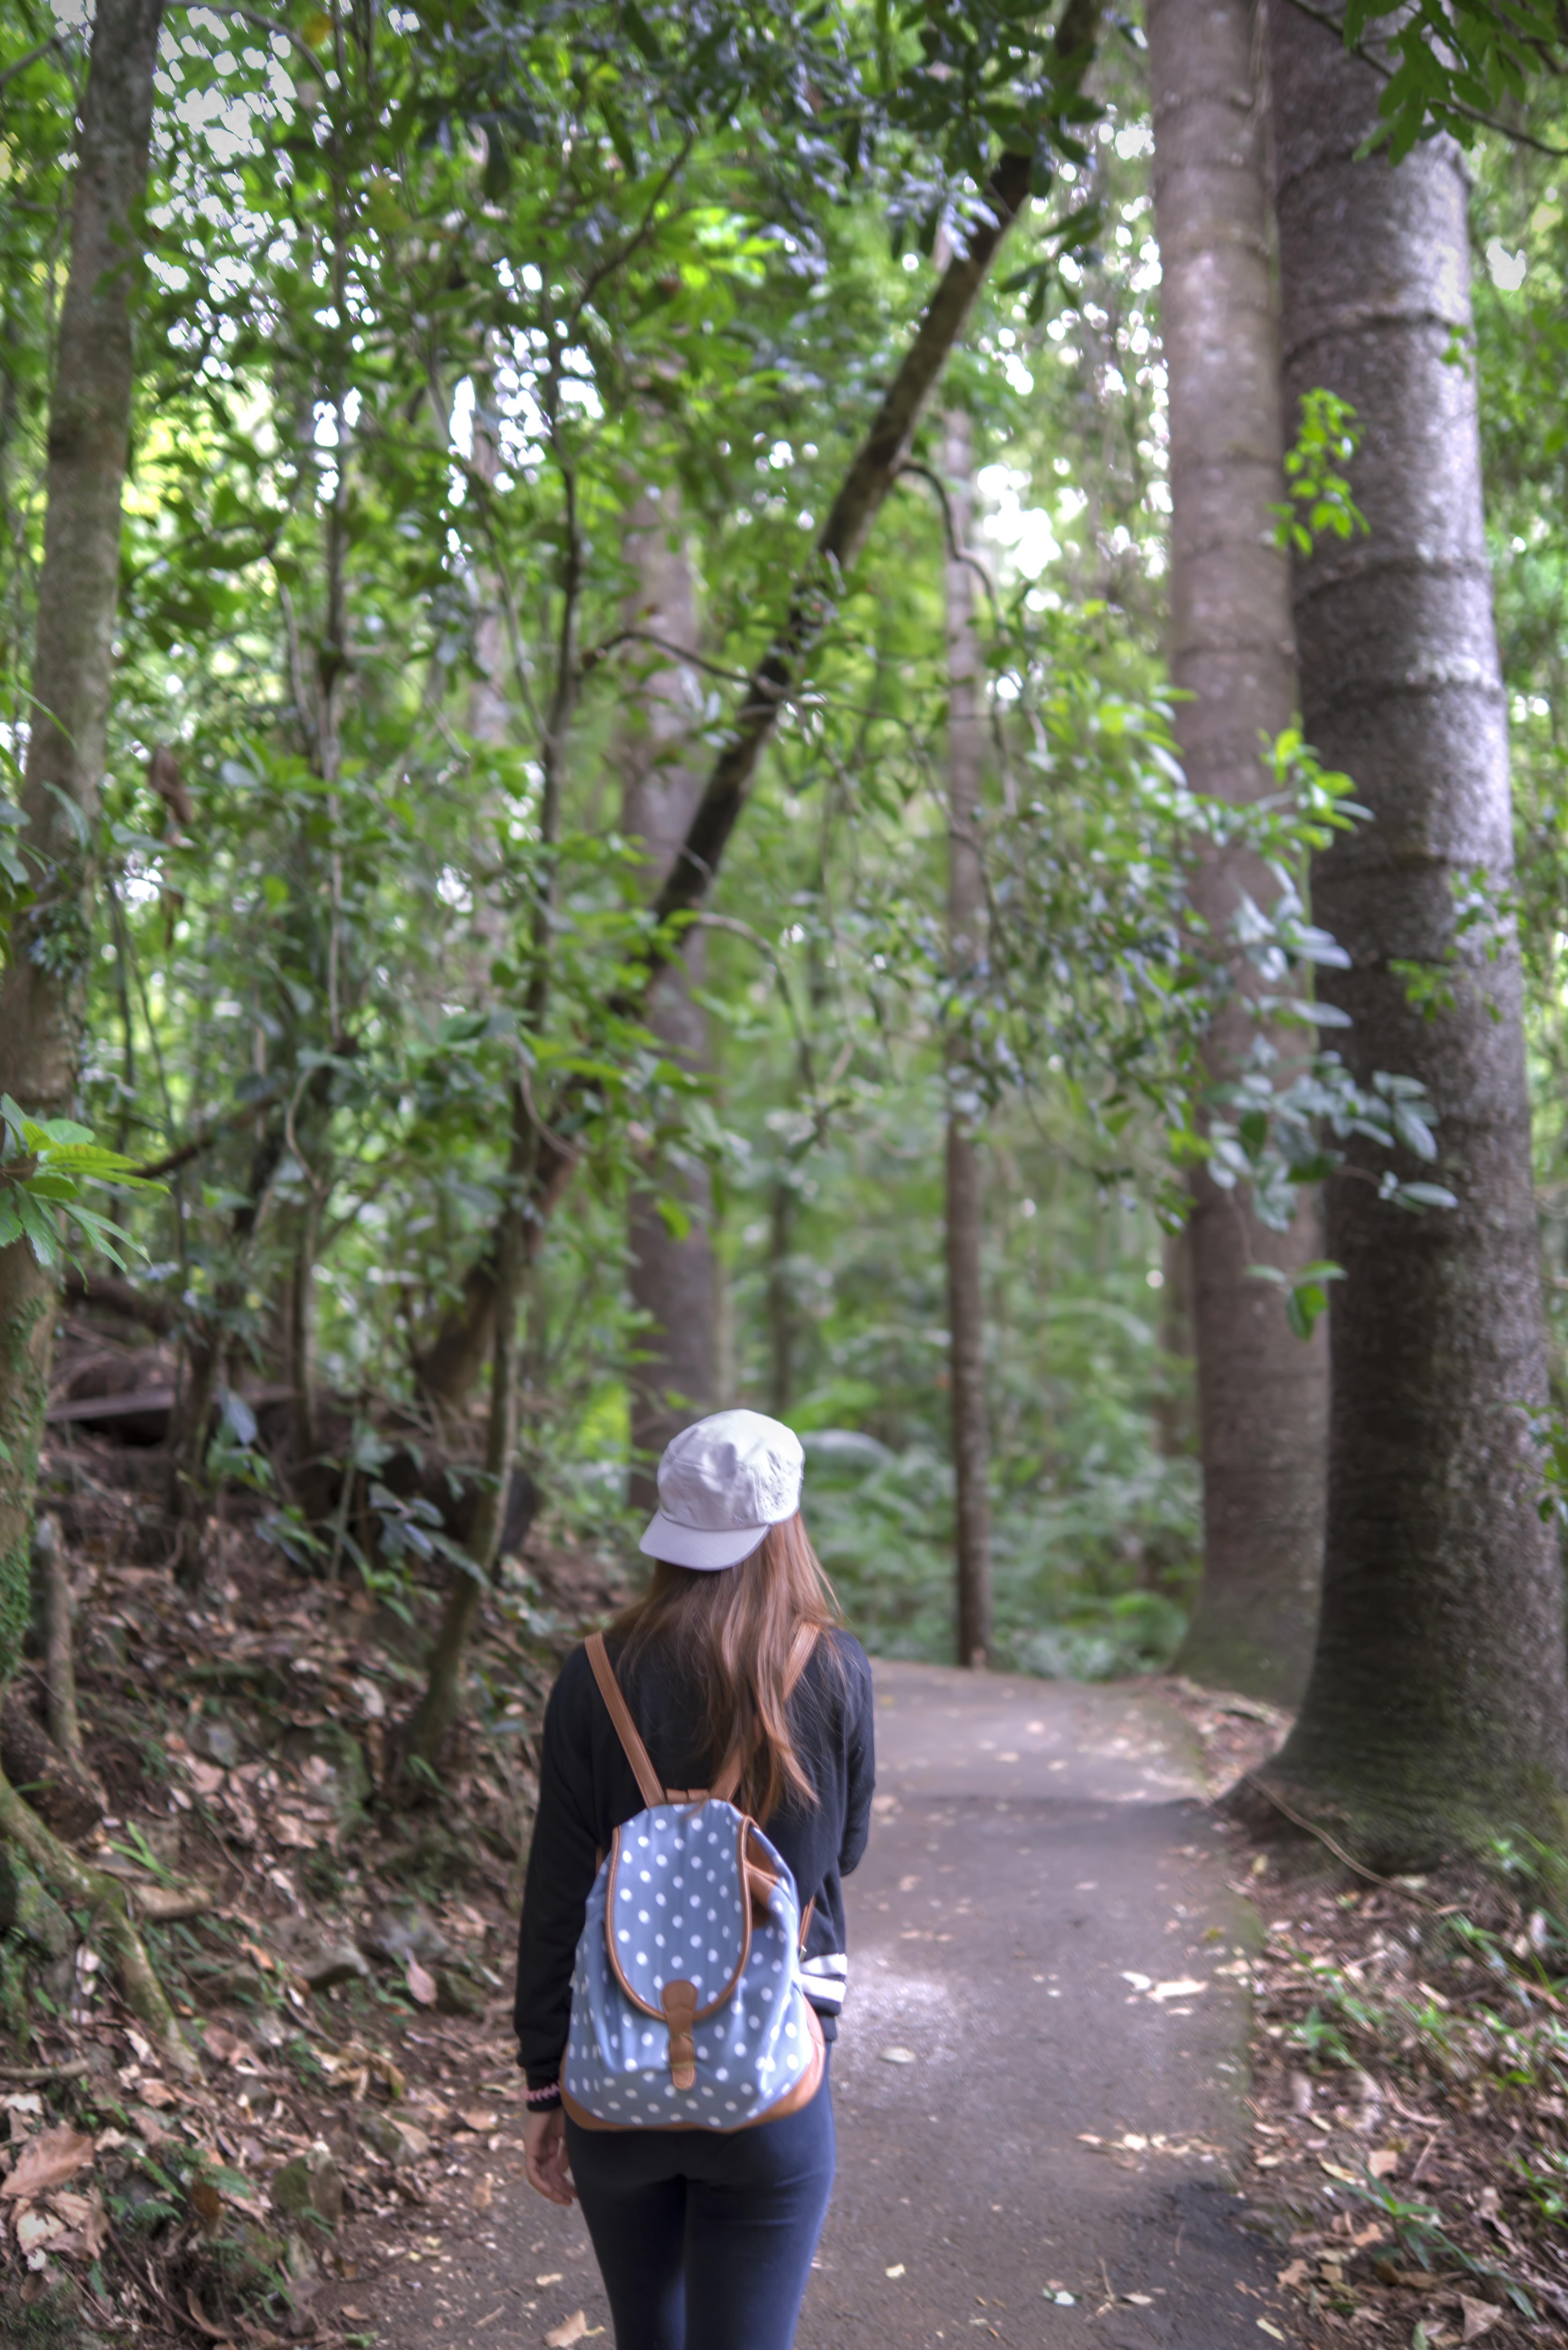 Free Images : coast, tree, forest, walking, trail, walk